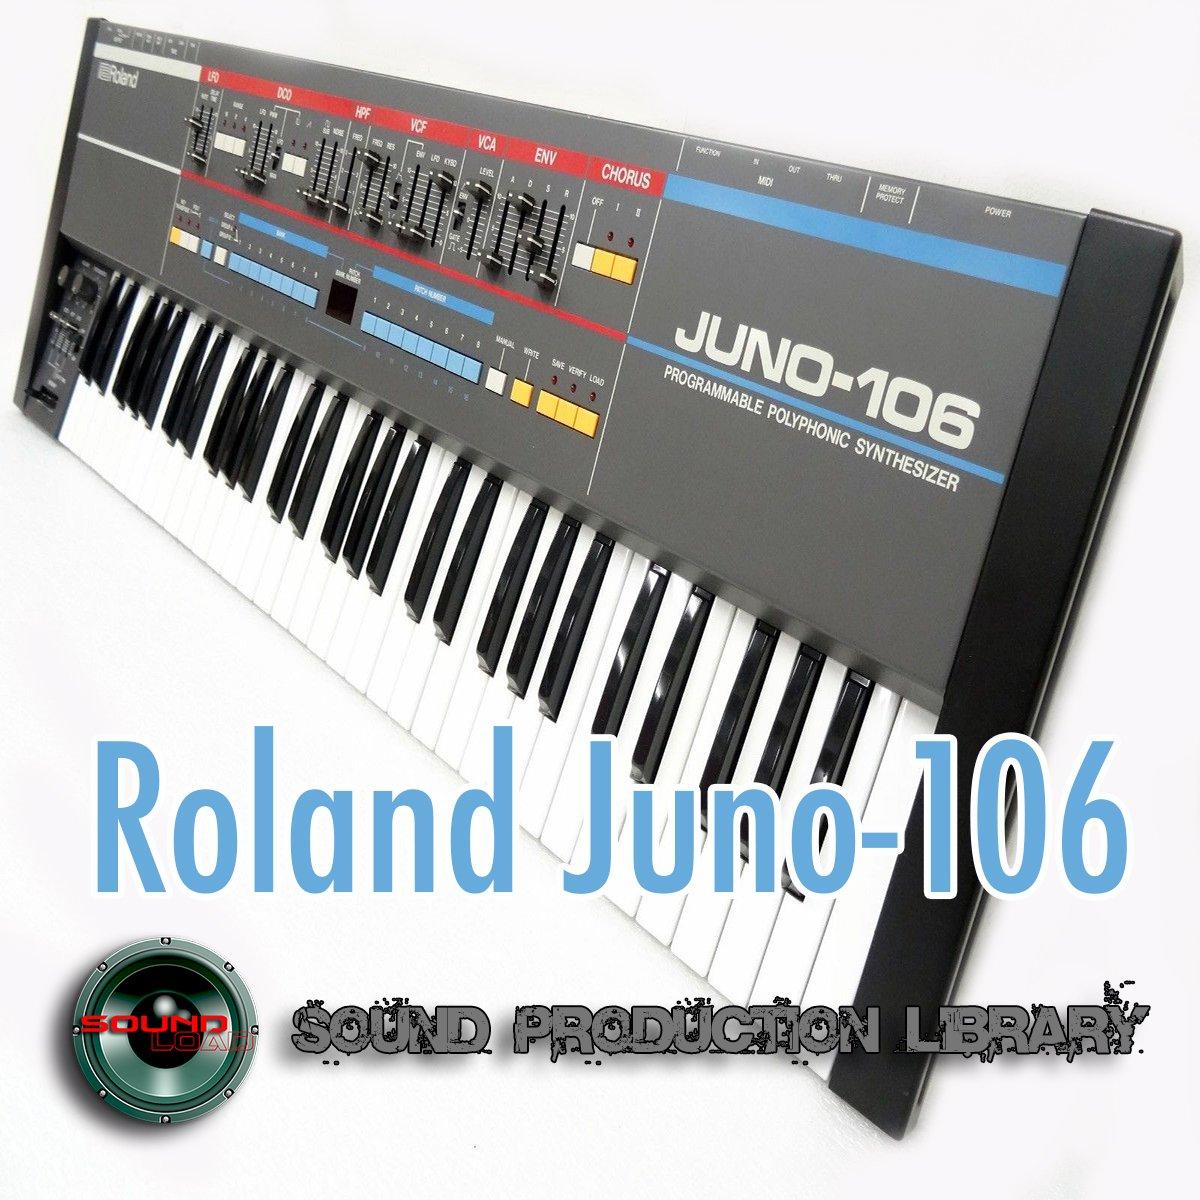 for Roland Juno-106 - the KING of Analog sound - unique original Huge WAVE/Kontakt Multi-Layer Samples Library on DVD or download by SoundLoad